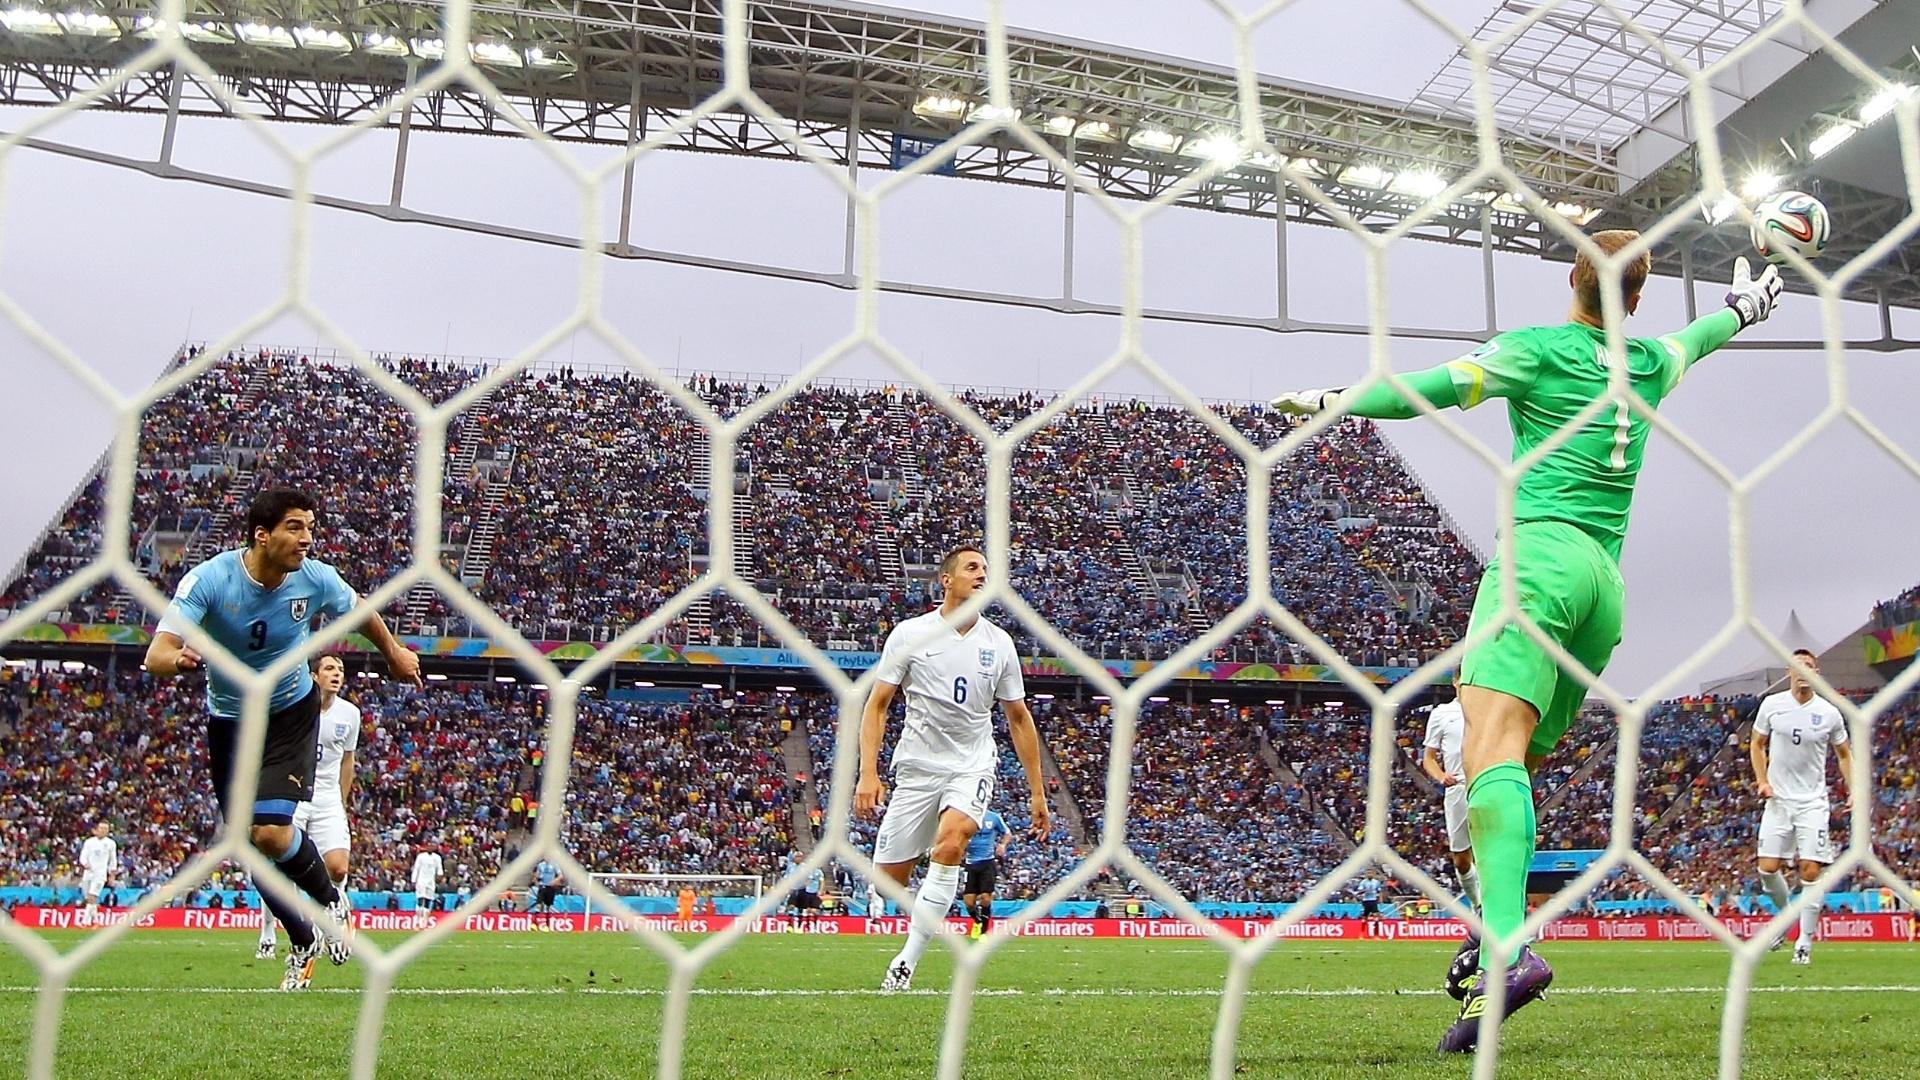 19.jun.2014 - Uruguaio Luis Suárez observa a bola entrar no gol inglês após cabecear e fazer seu primeiro gol nesta Copa